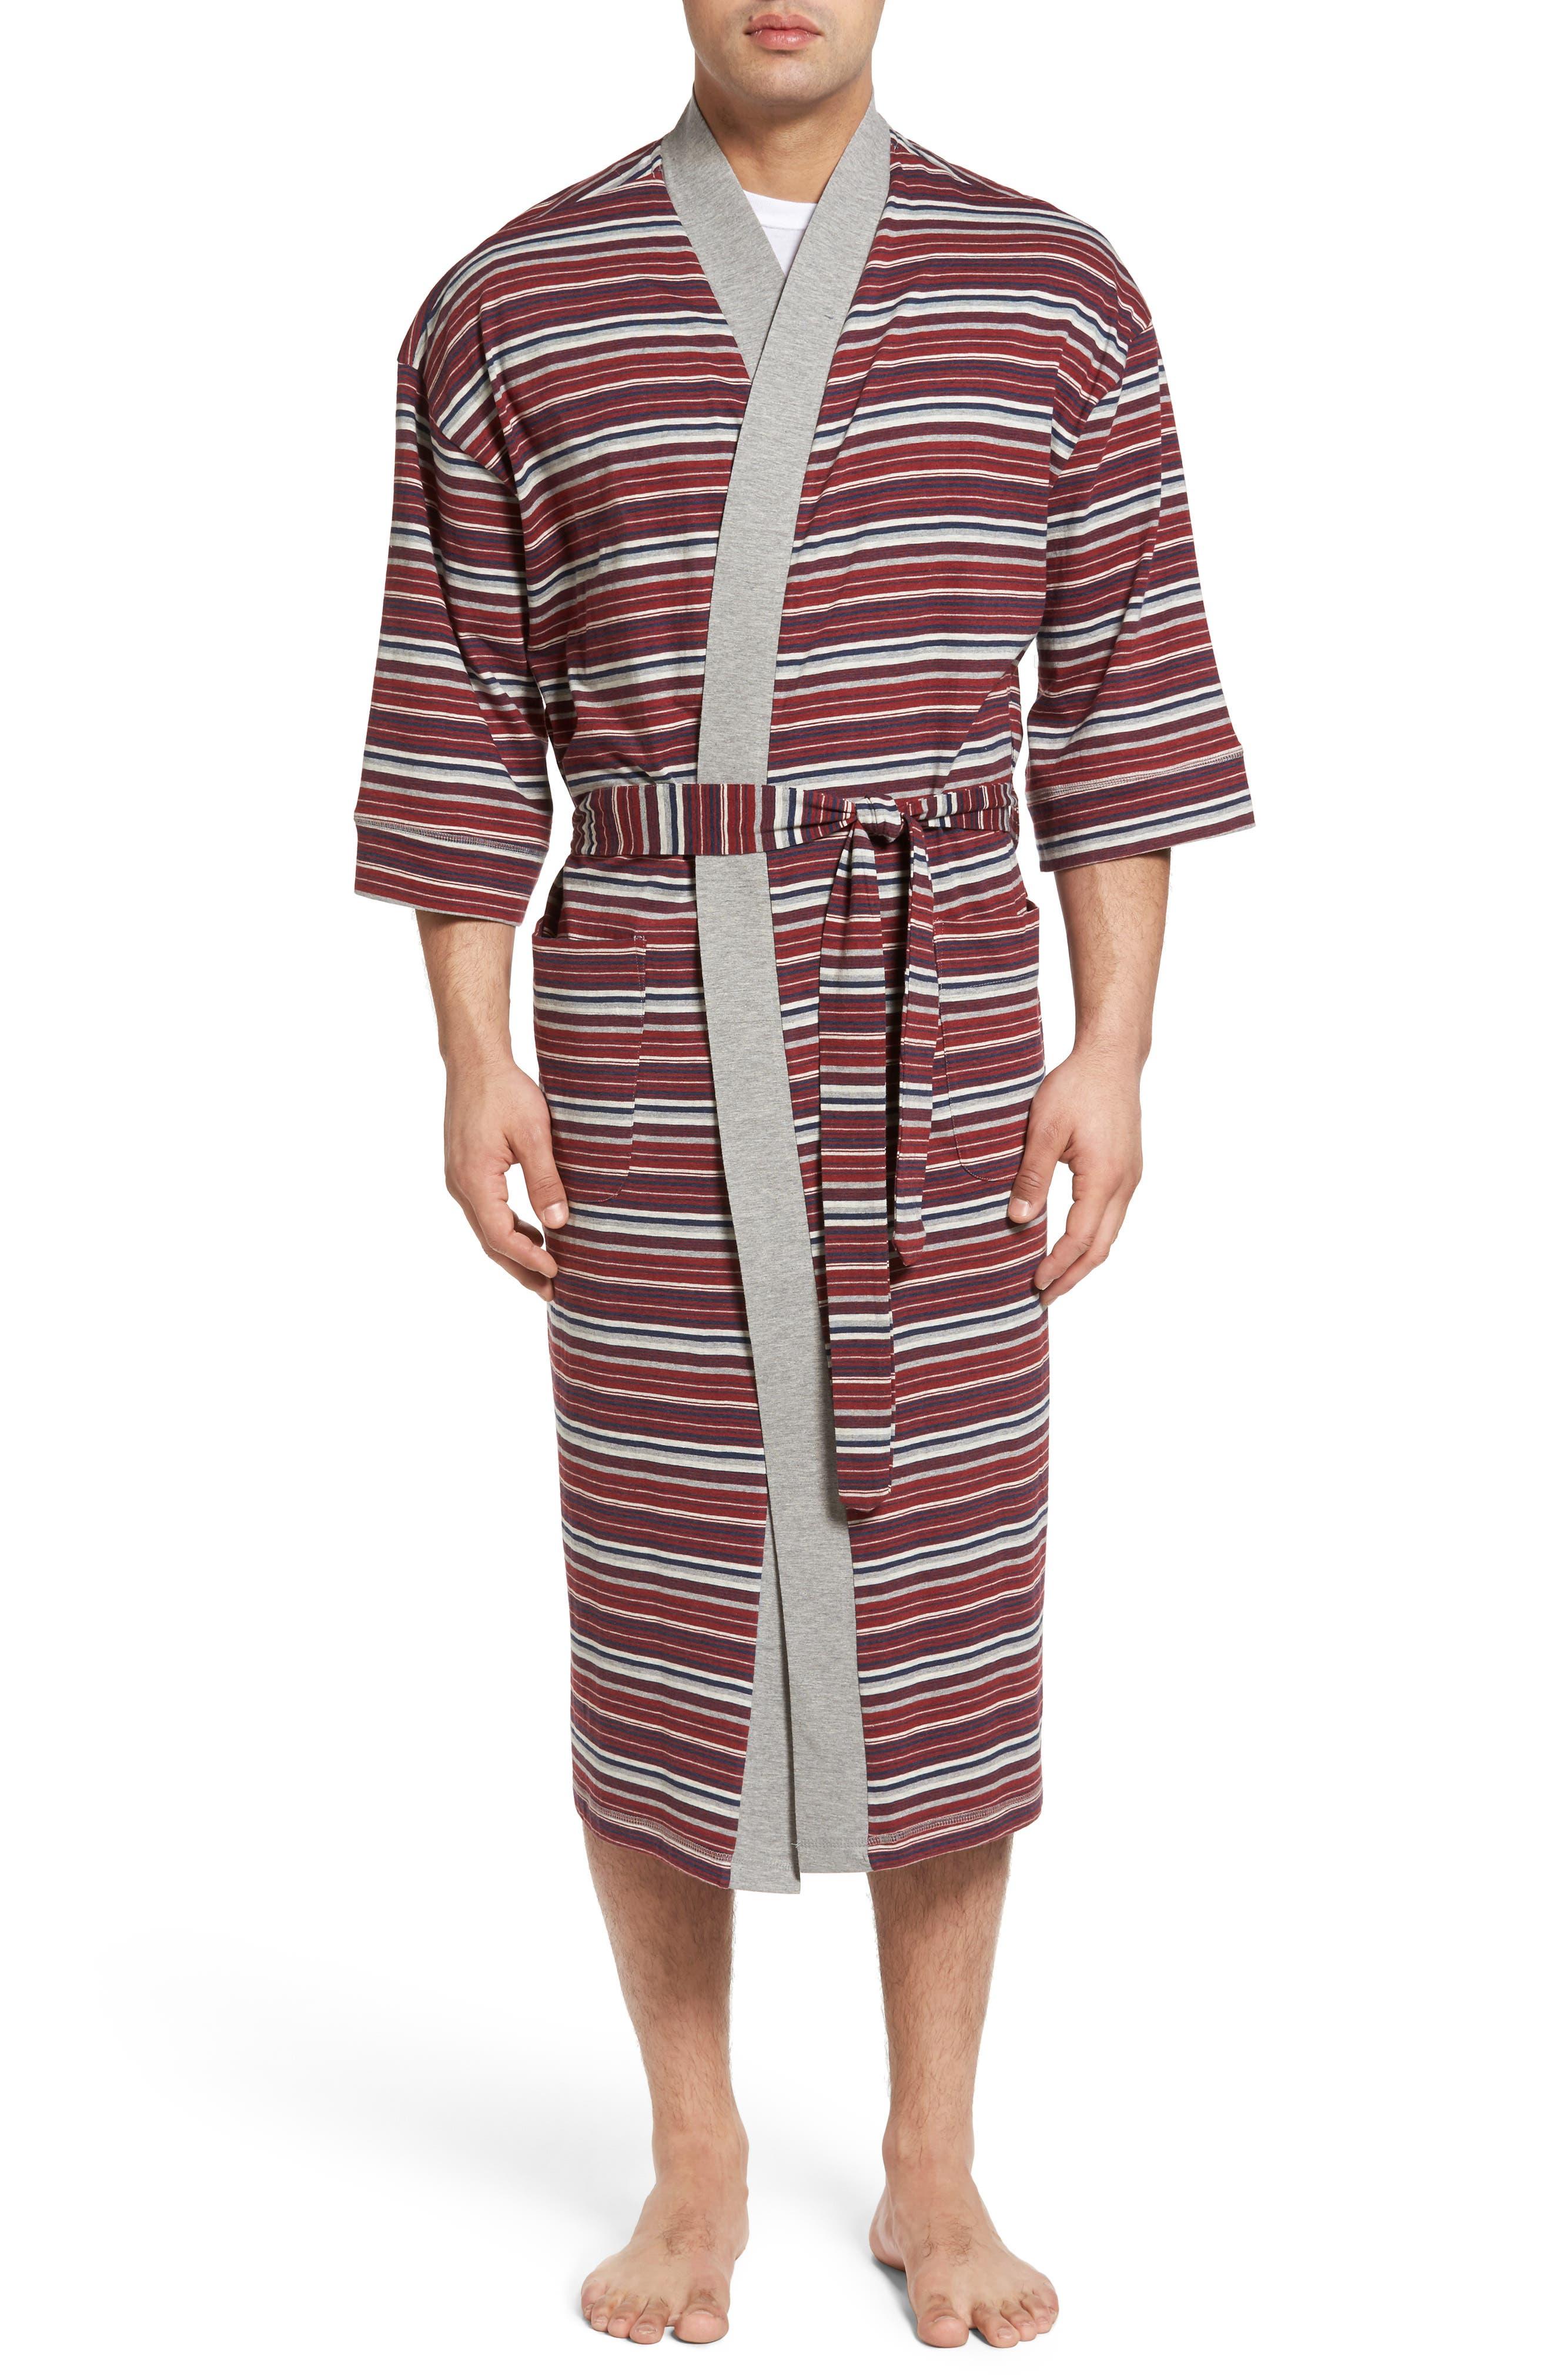 MAJESTIC INTERNATIONAL Big Daddy Robe, Main, color, 600